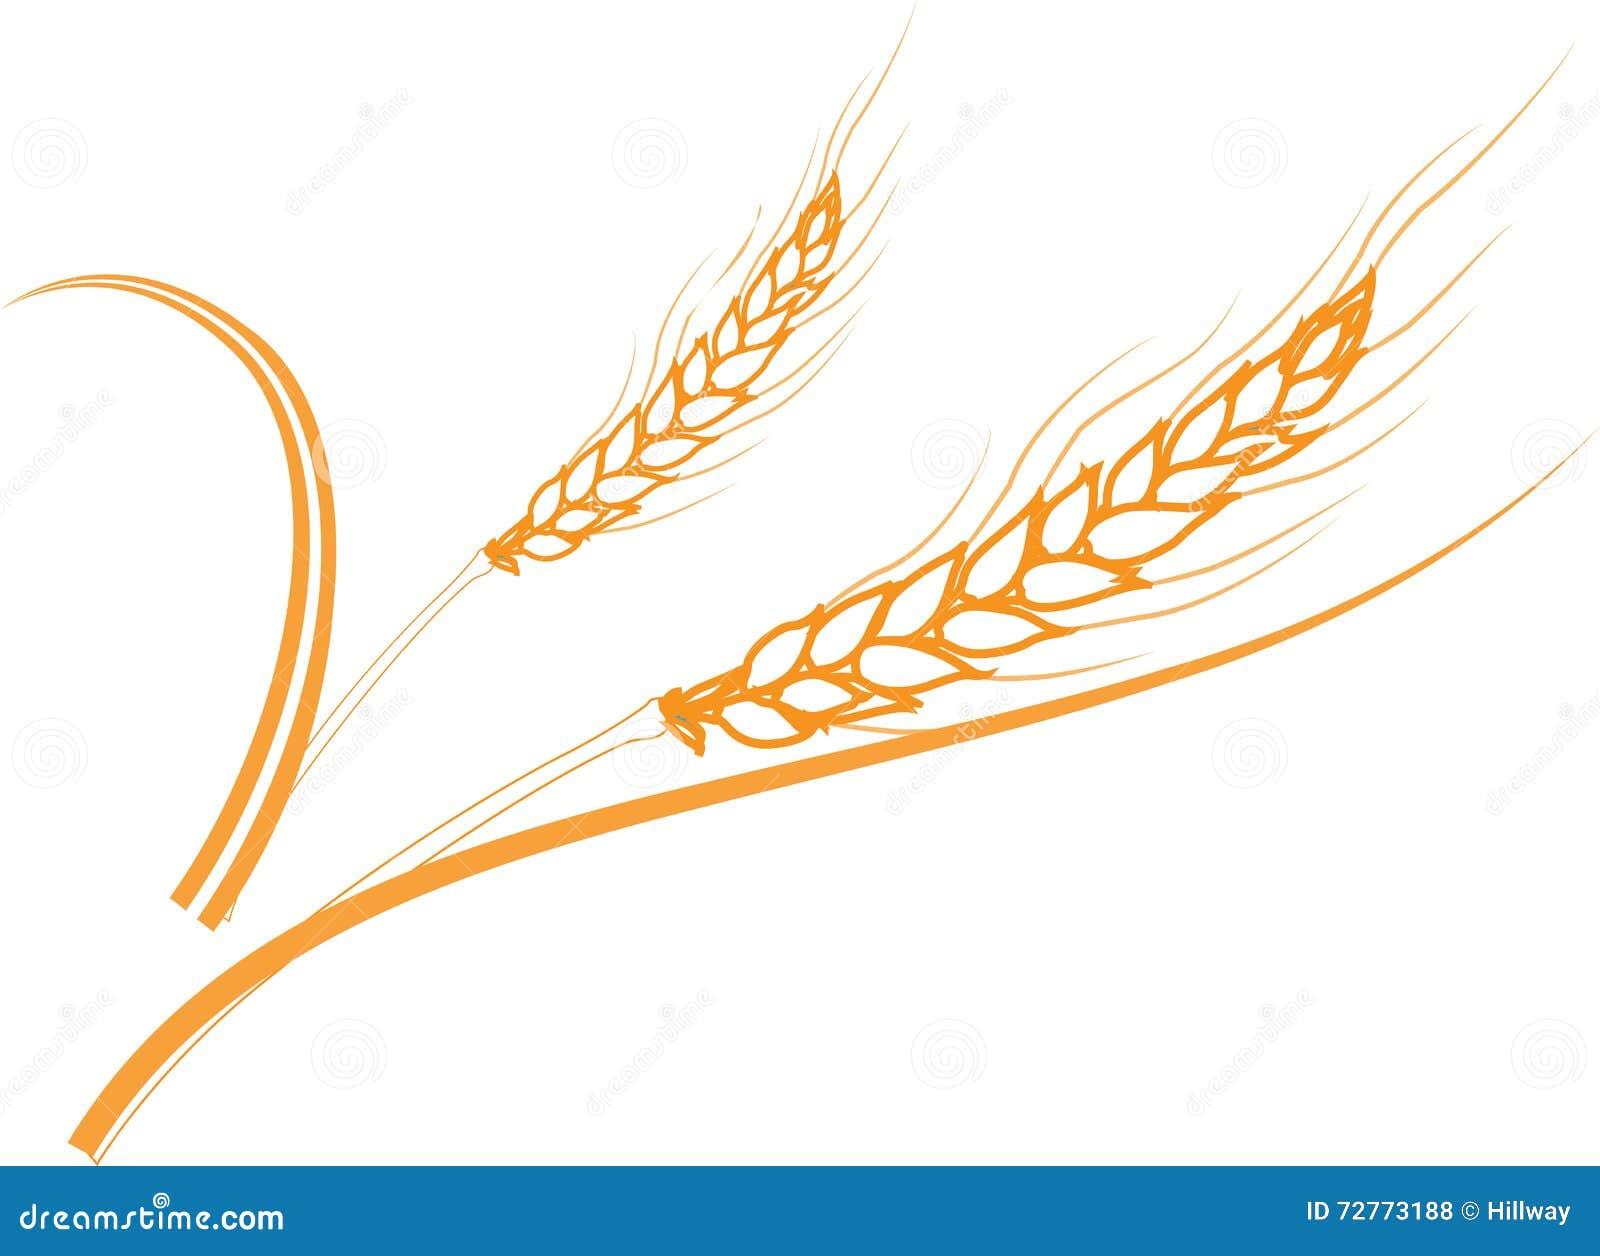 Gold Ripe Wheat Ears Frame Border Or Corner Element Royalty Free Stock Photos